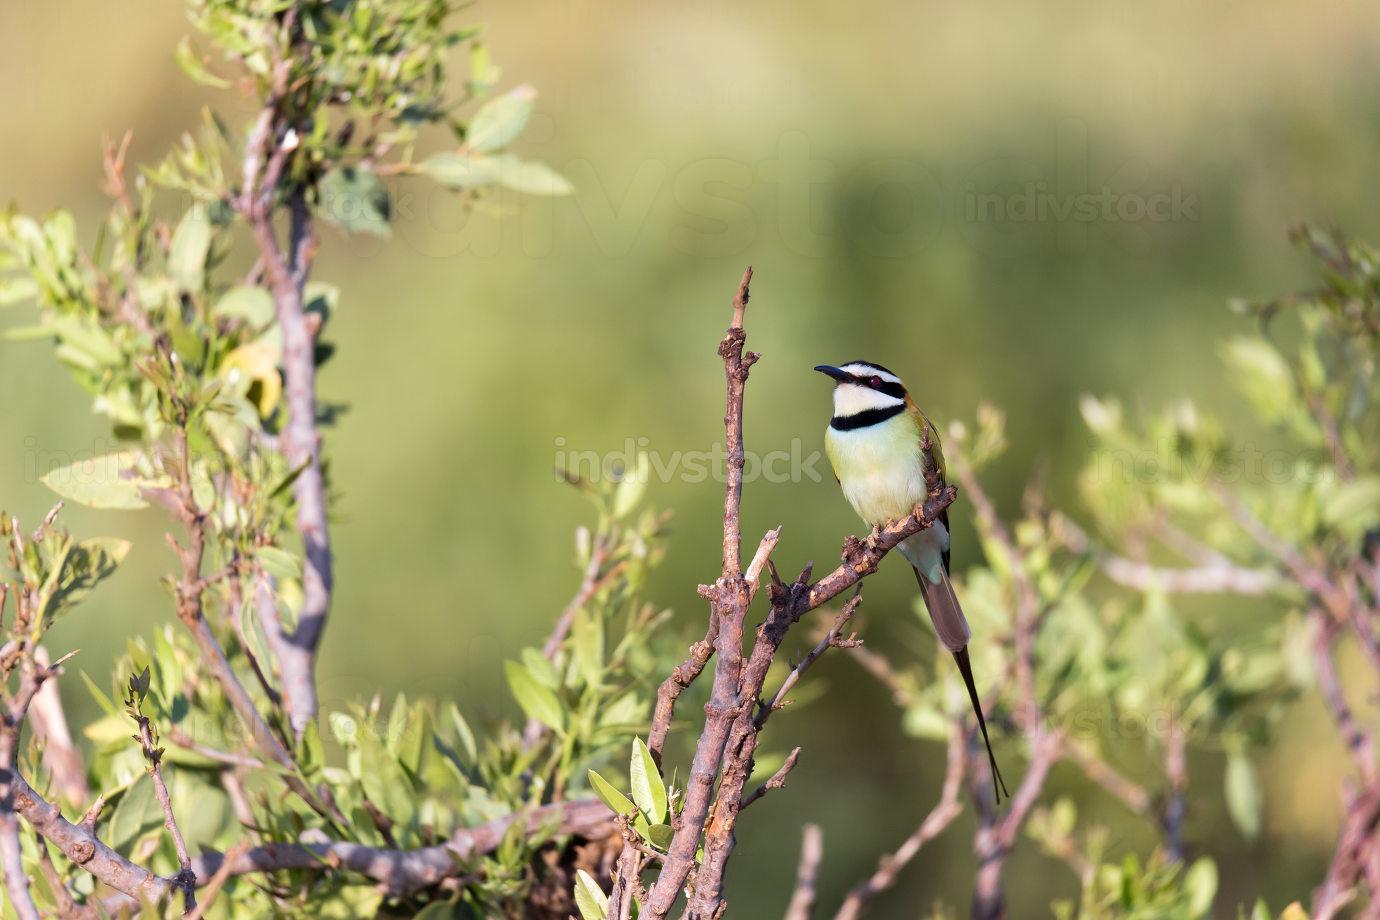 Local bird is sitting on a branch in Kenya